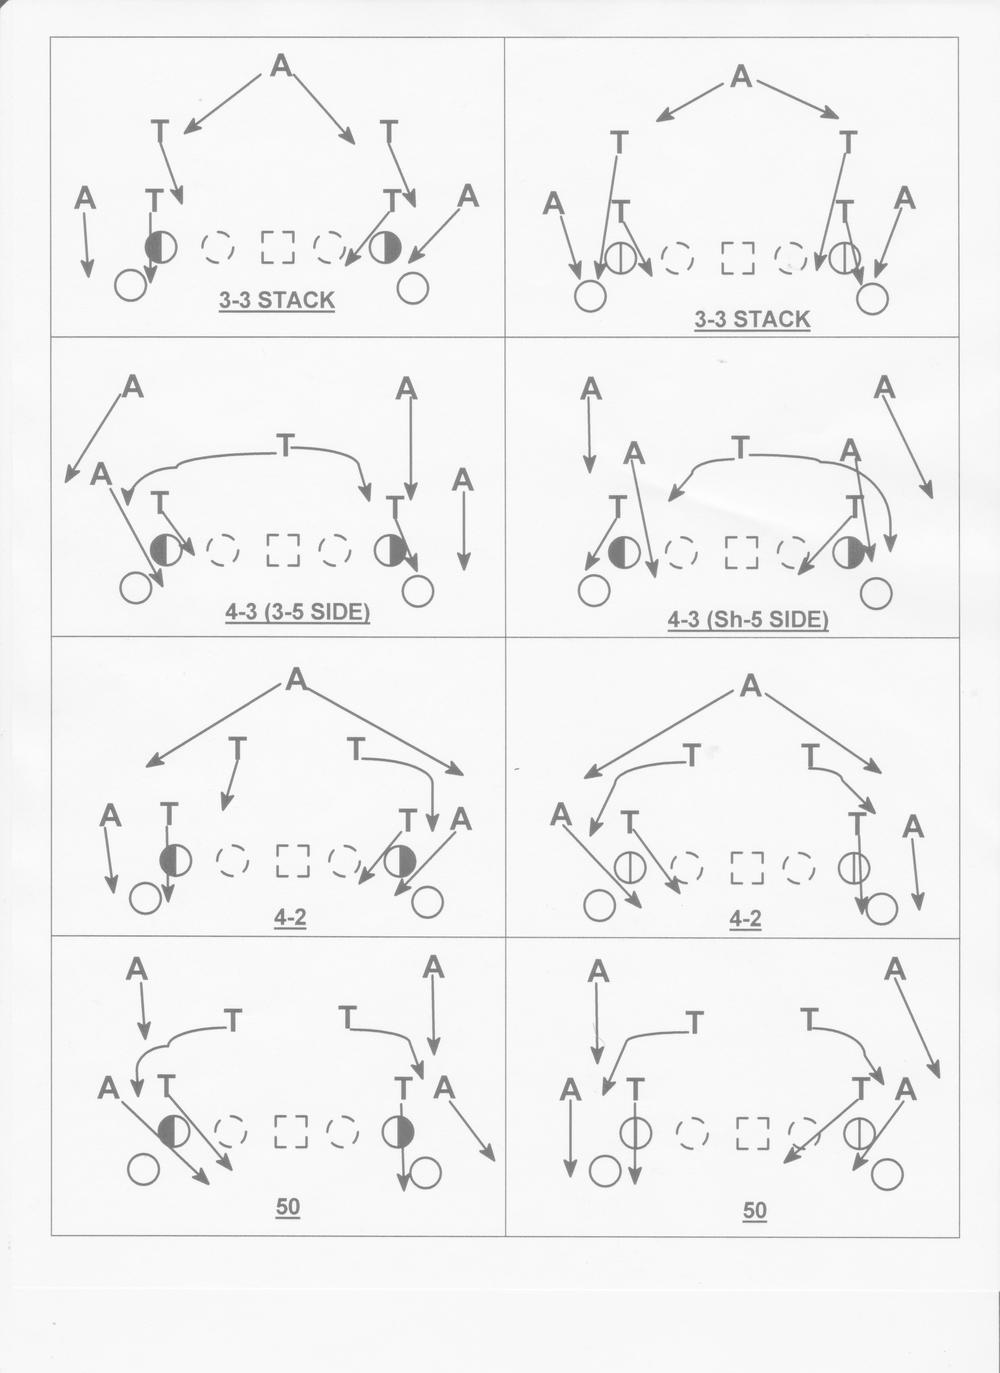 Defensive Movements/Stunts